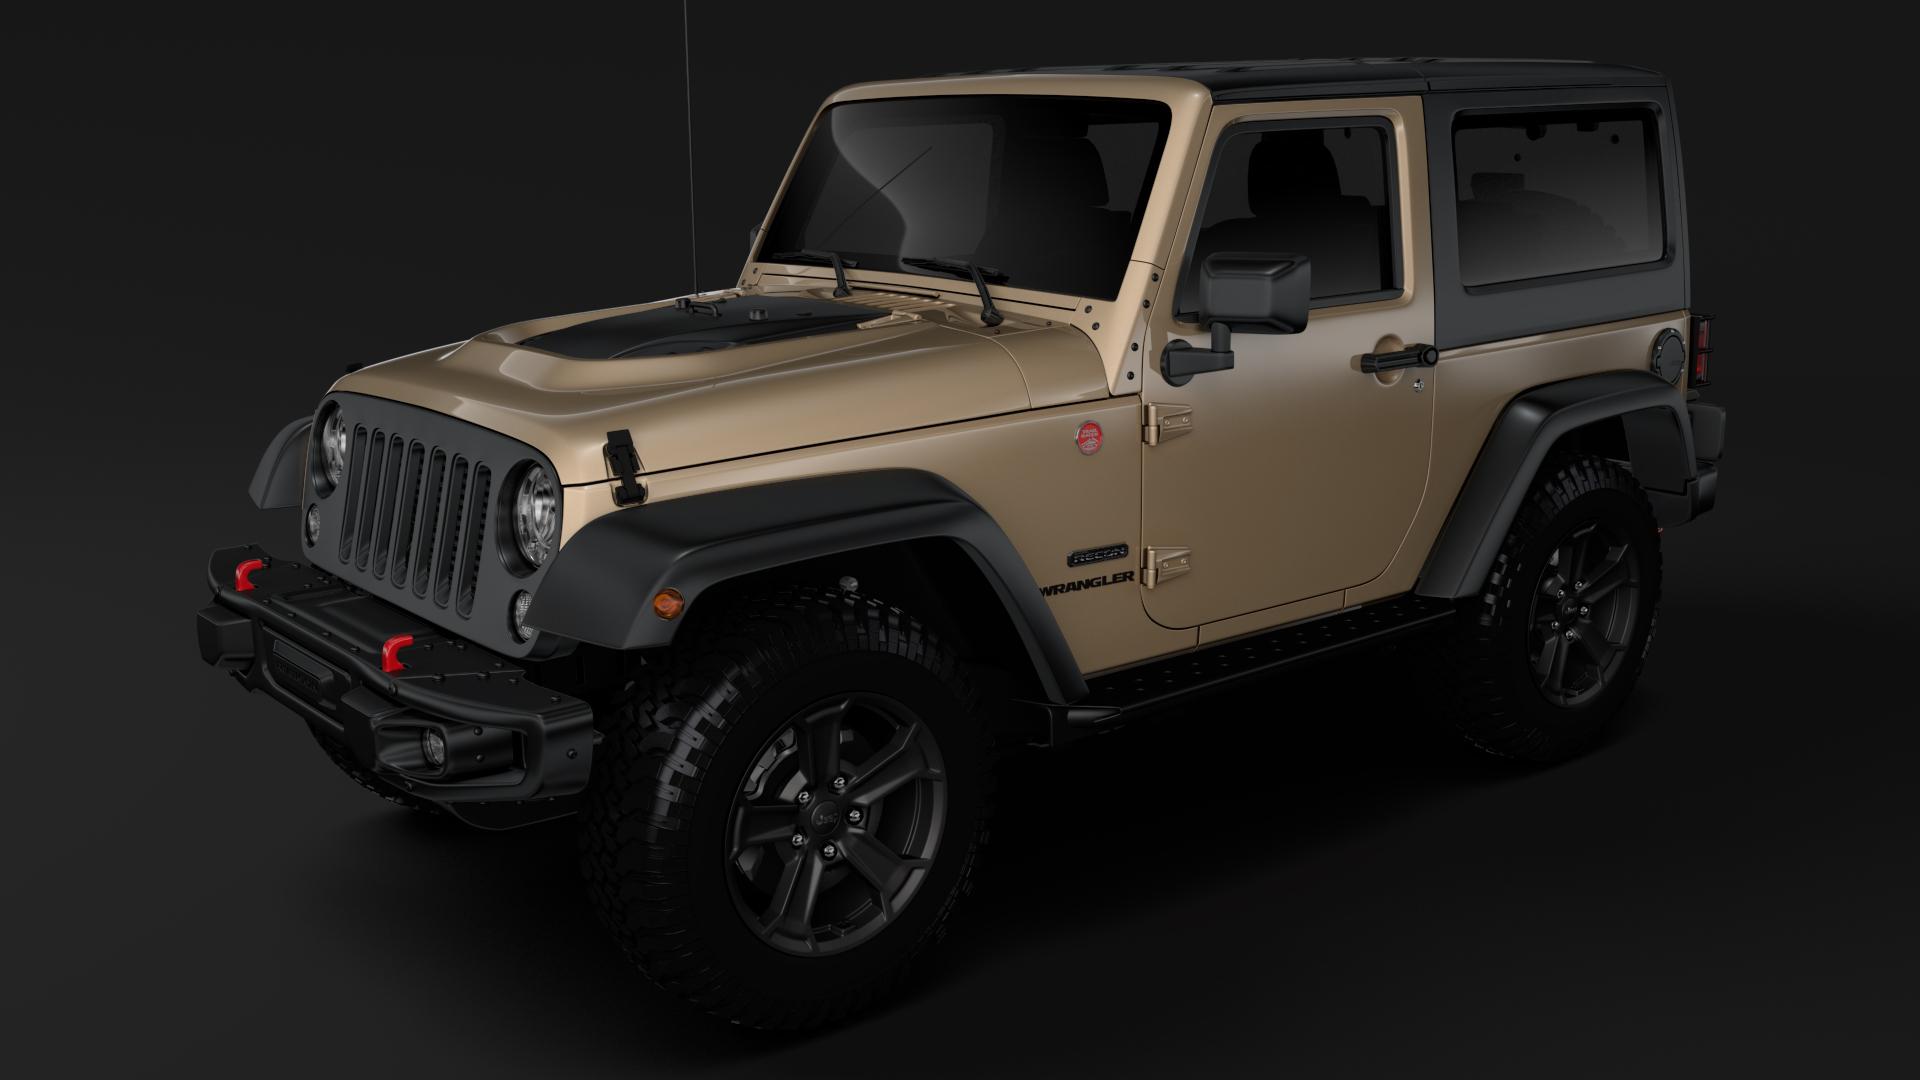 jeep wrangler rubicon recon jk 2017 3d model max fbx lwo ma mb hrc xsi obj 276943